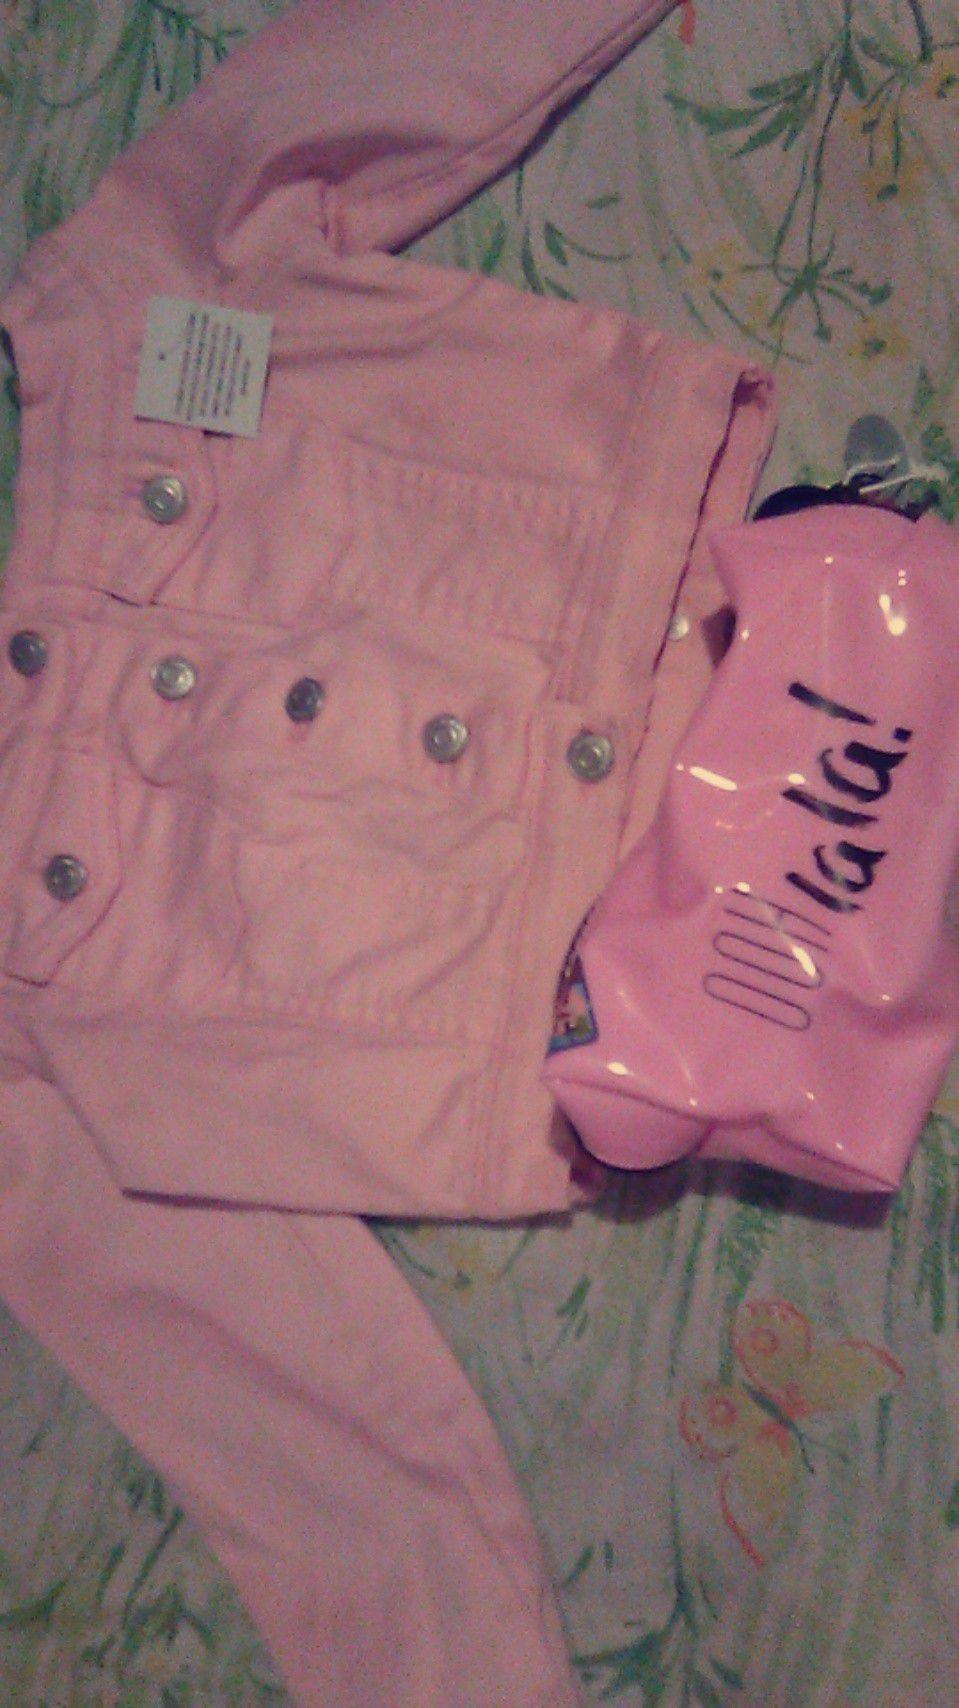 Parisian pink denim jackets and a bag